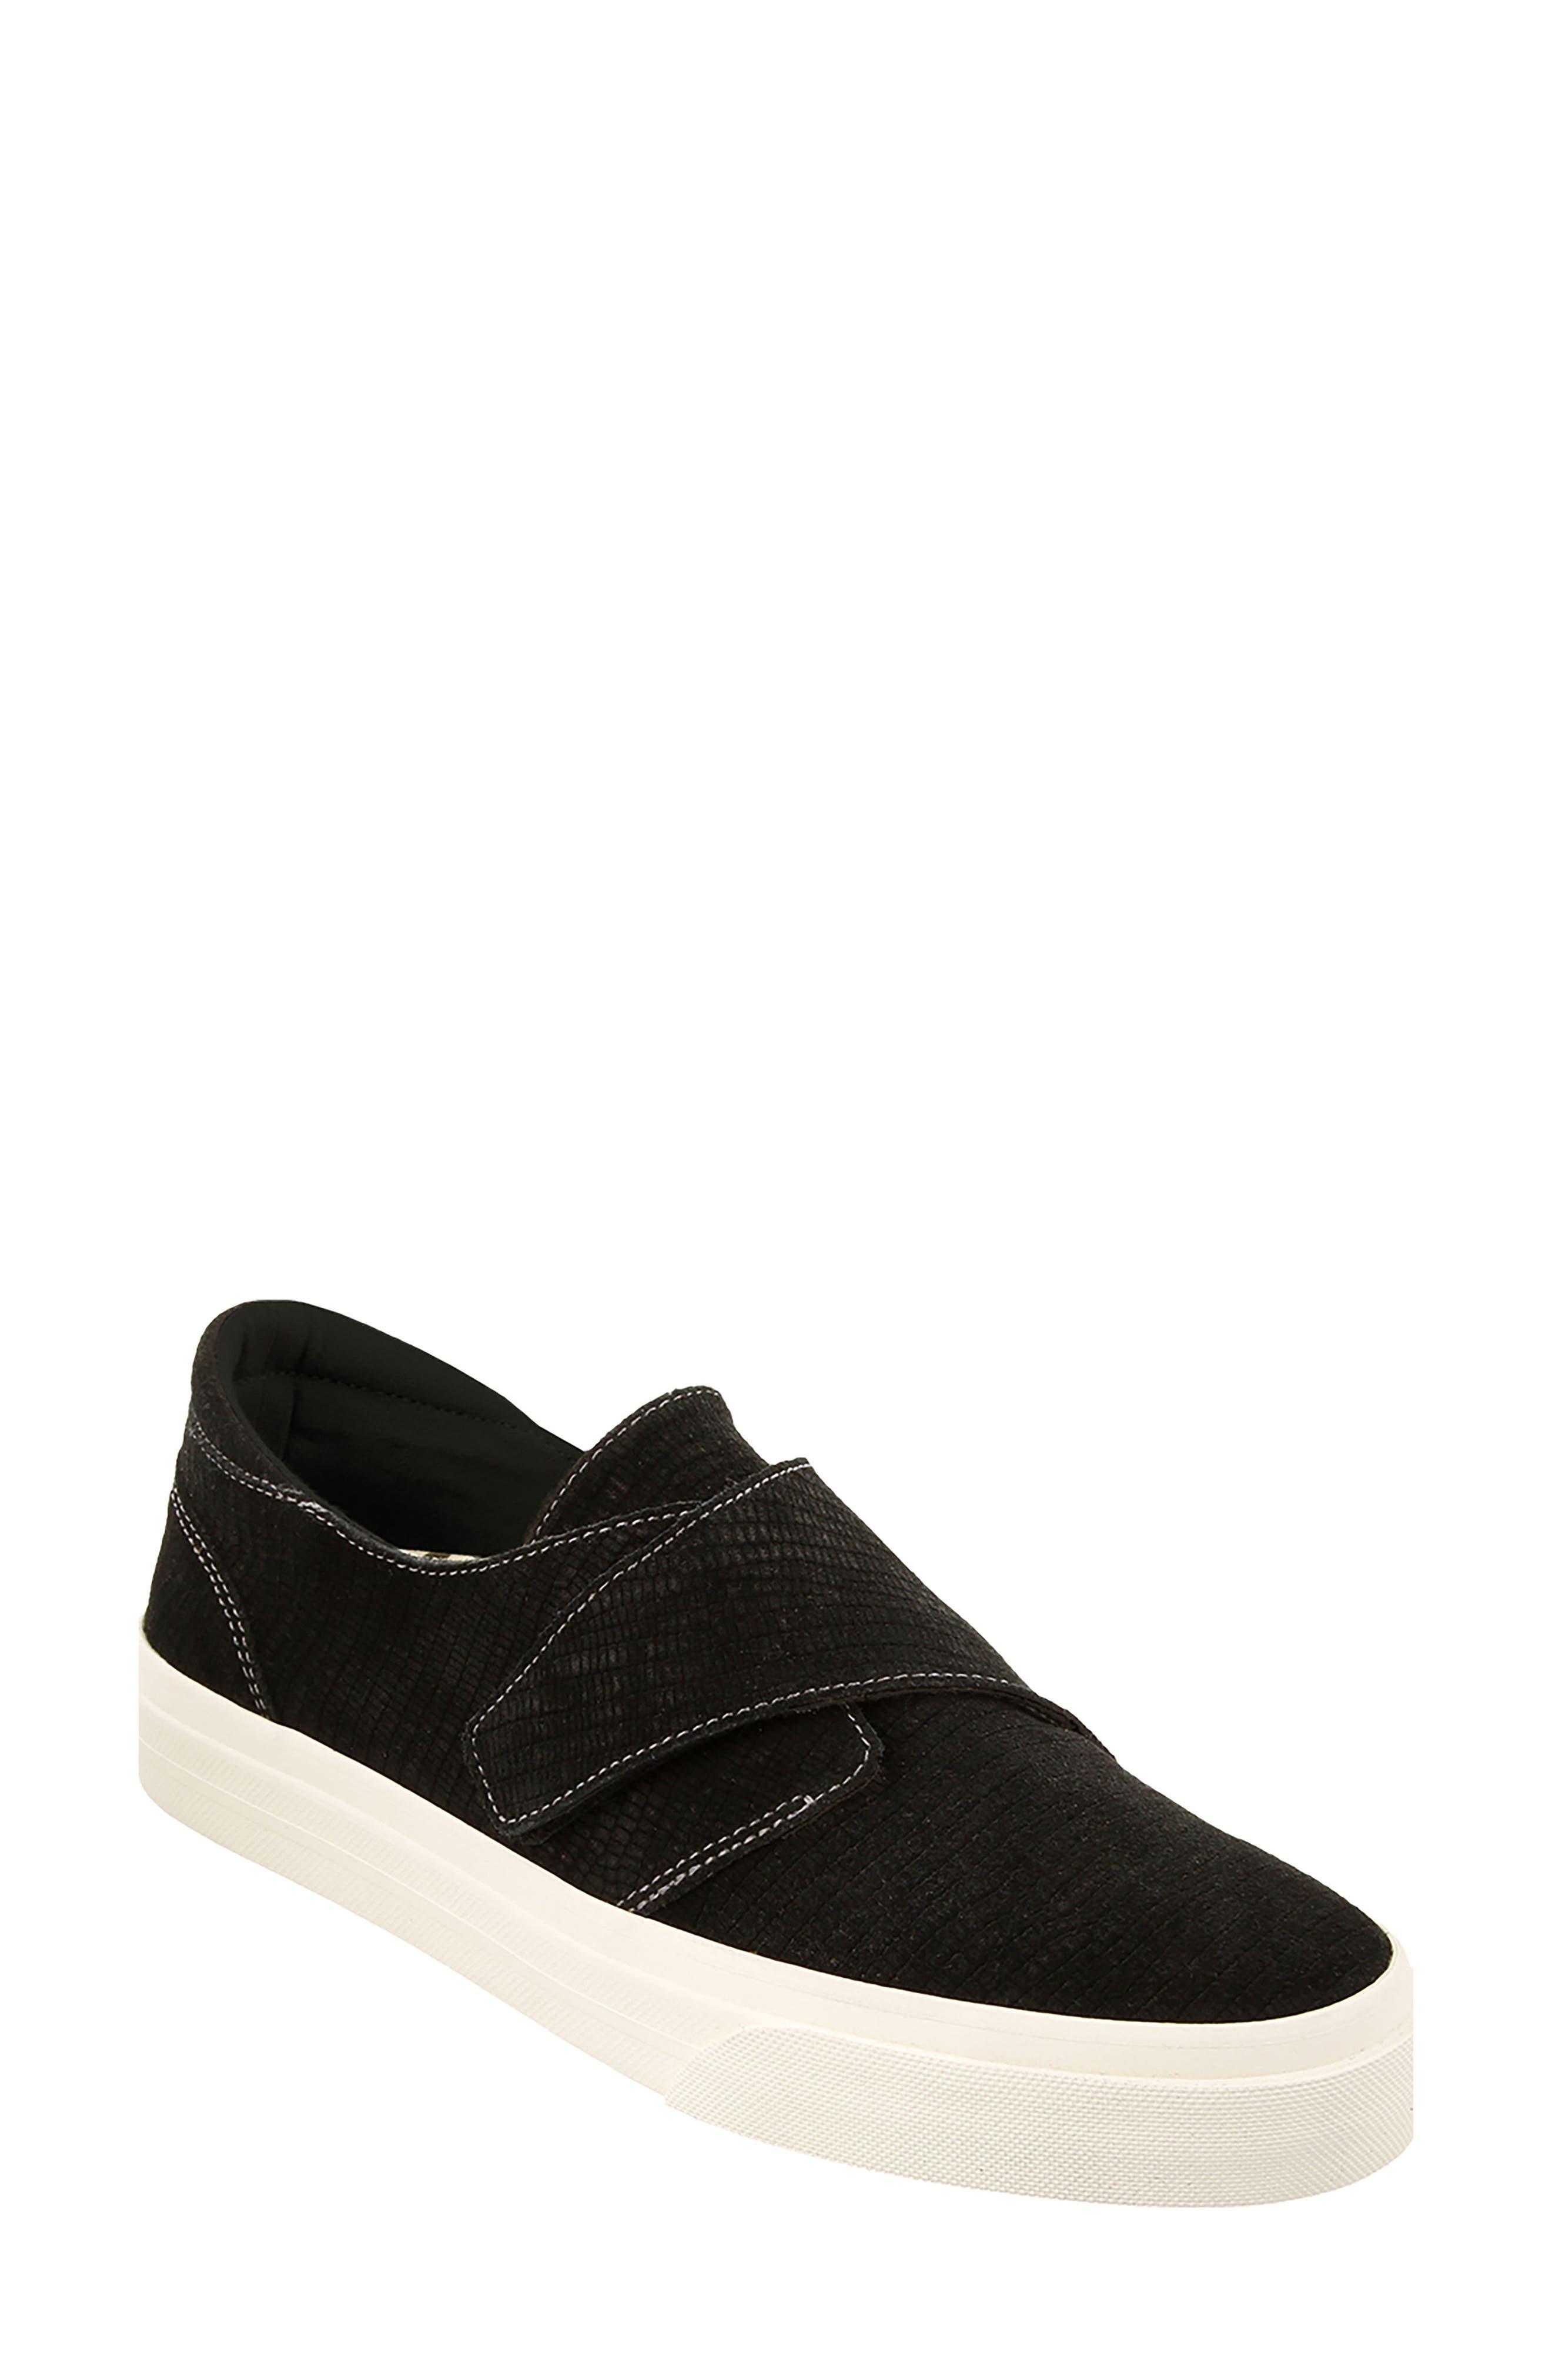 Soul Sneaker,                             Main thumbnail 1, color,                             Black Emboss Suede